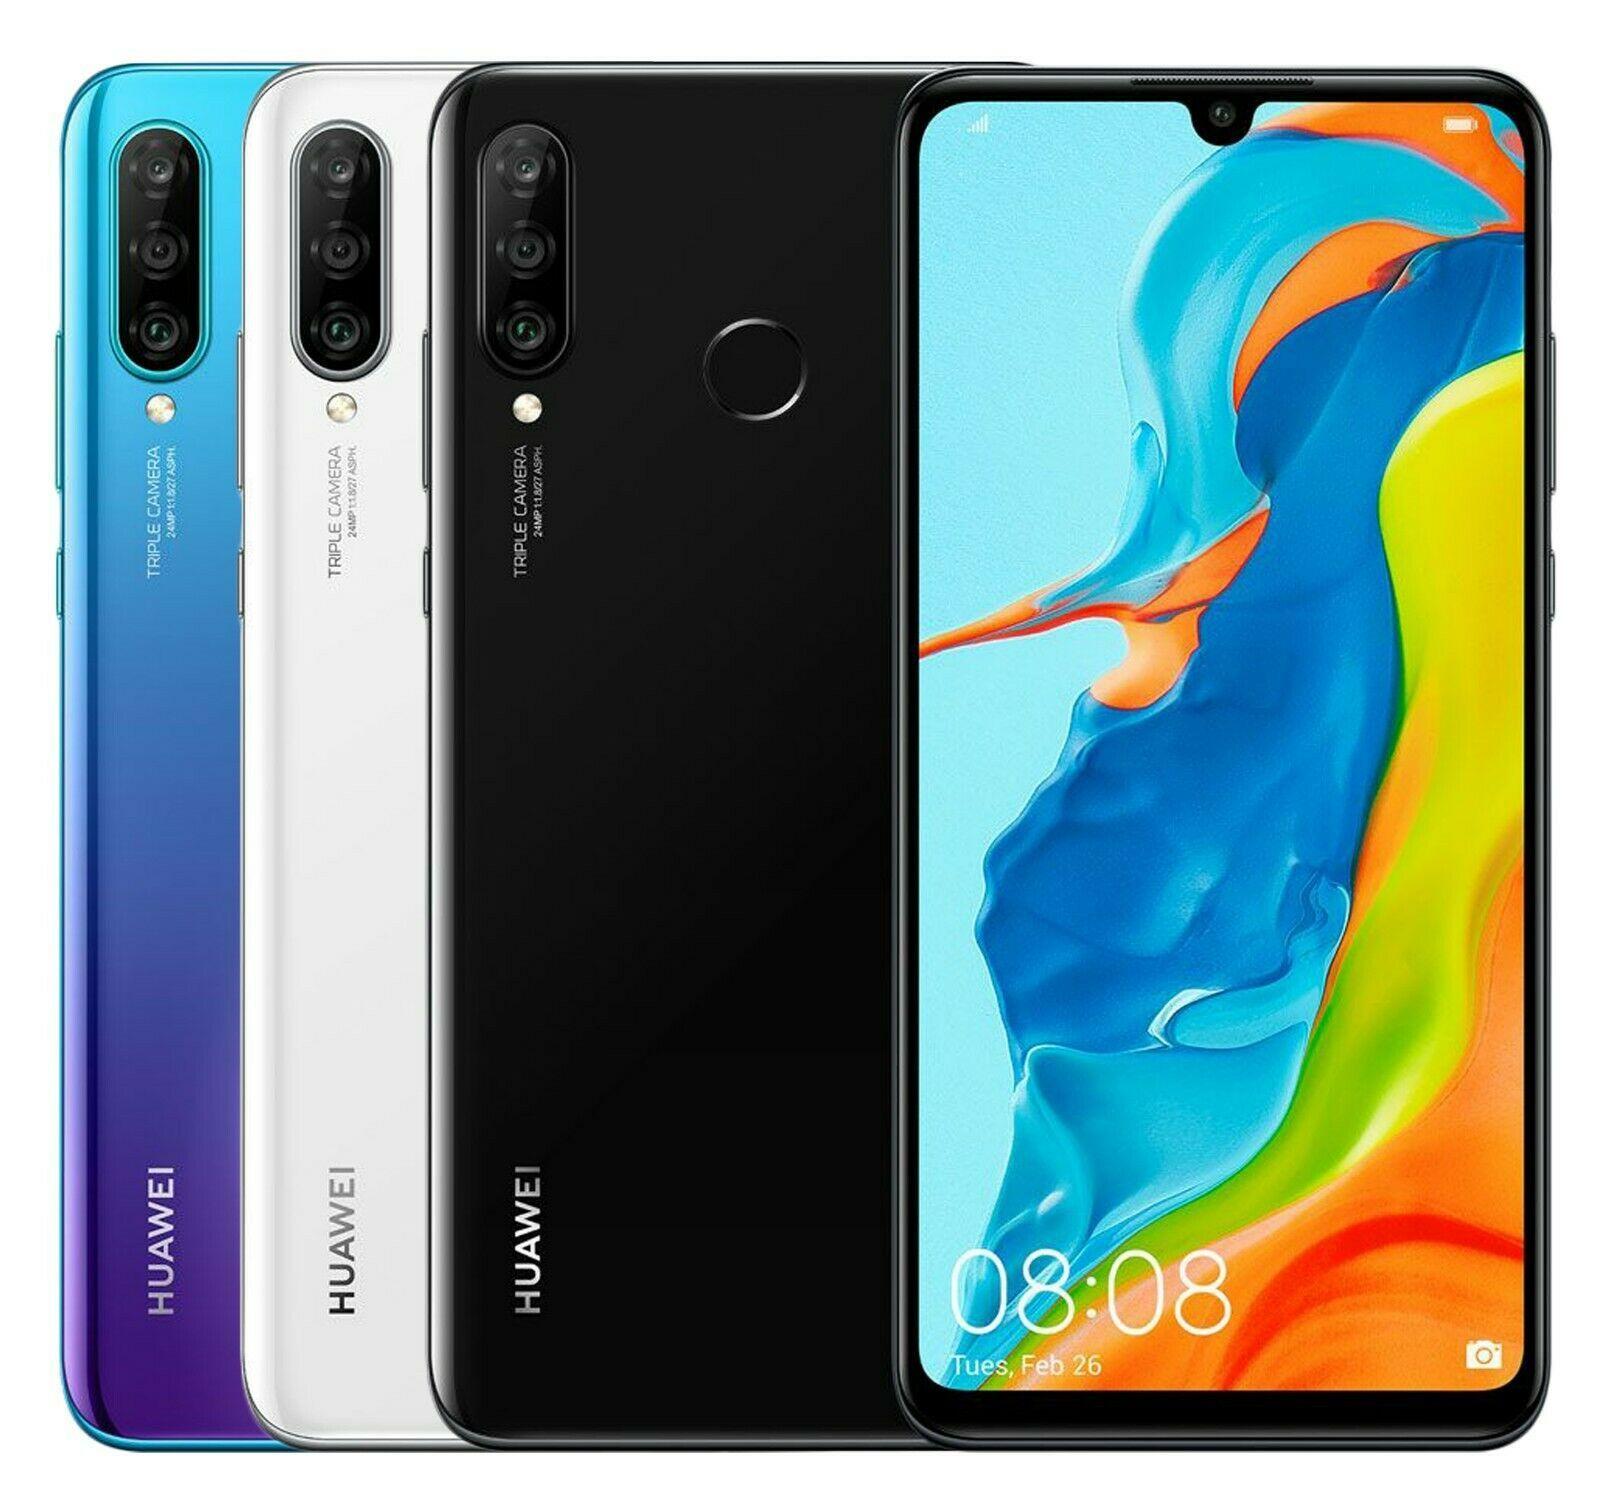 "Huawei P30 lite - 6.15"" Dual-SIM Smartphone (4GB / 128GB, USB-C, NFC, Android 9) in 4x Farben"